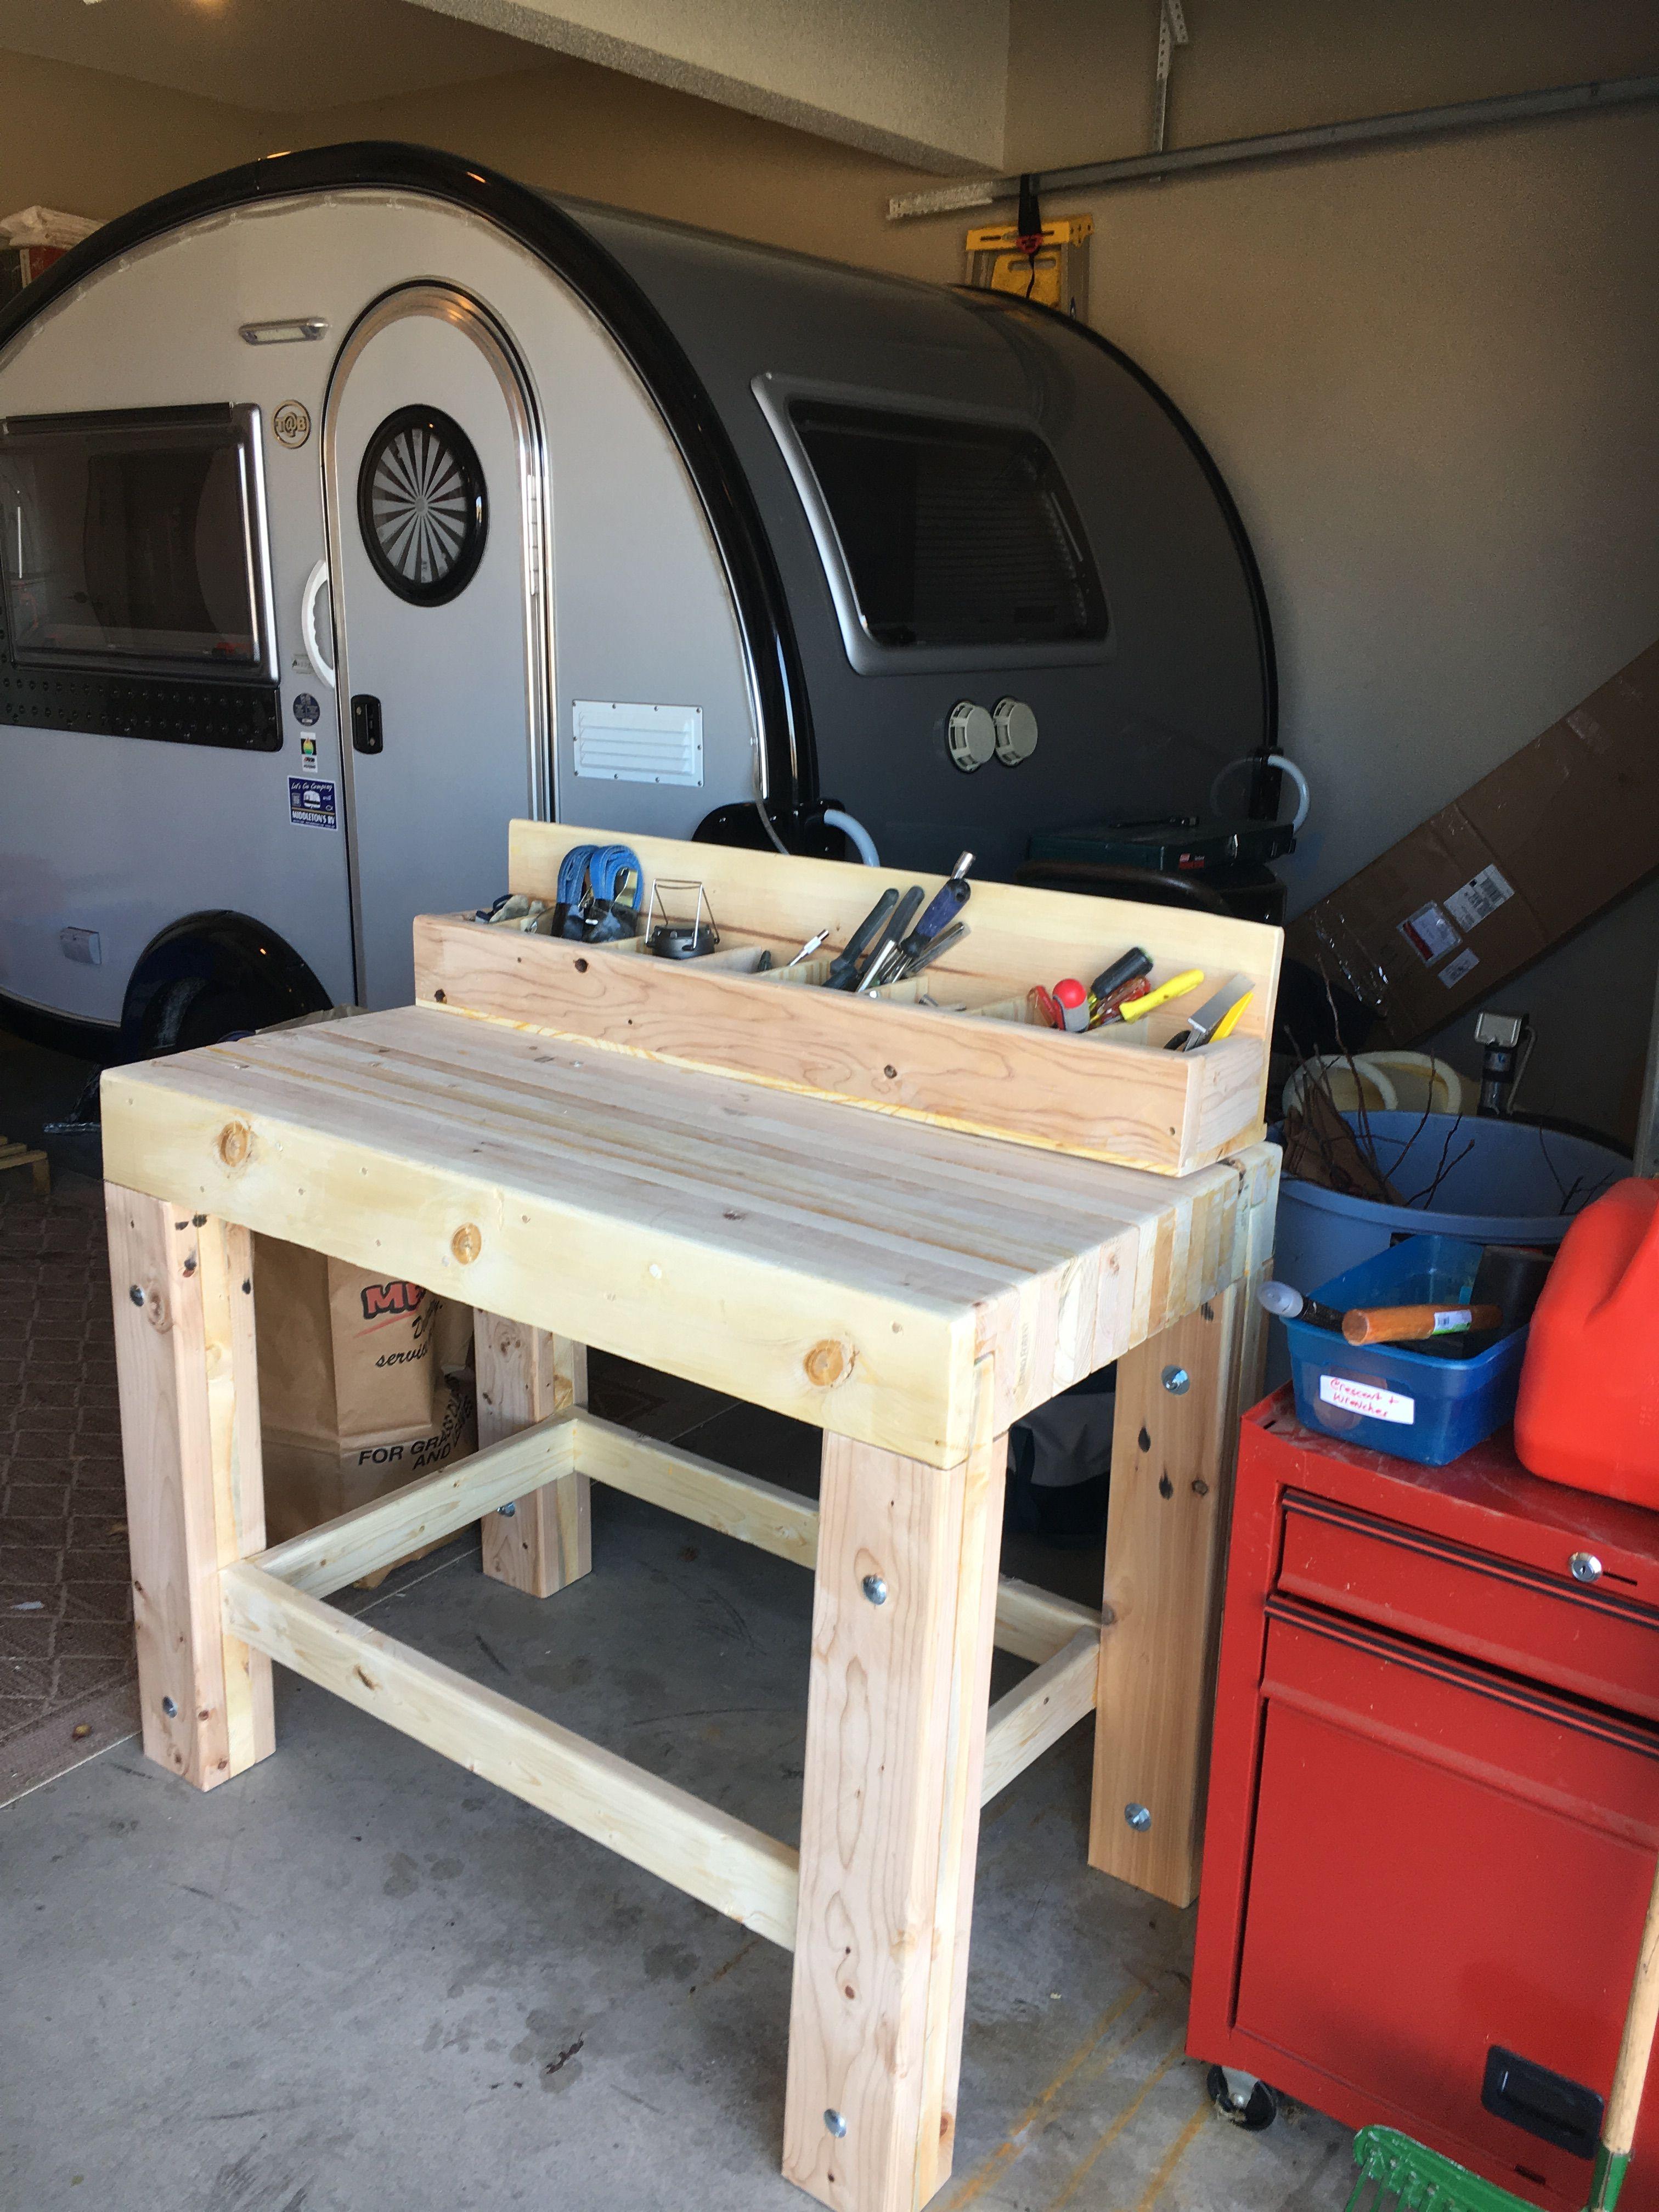 My garage workbench - I like solid stuff, 2x6 lumber, top